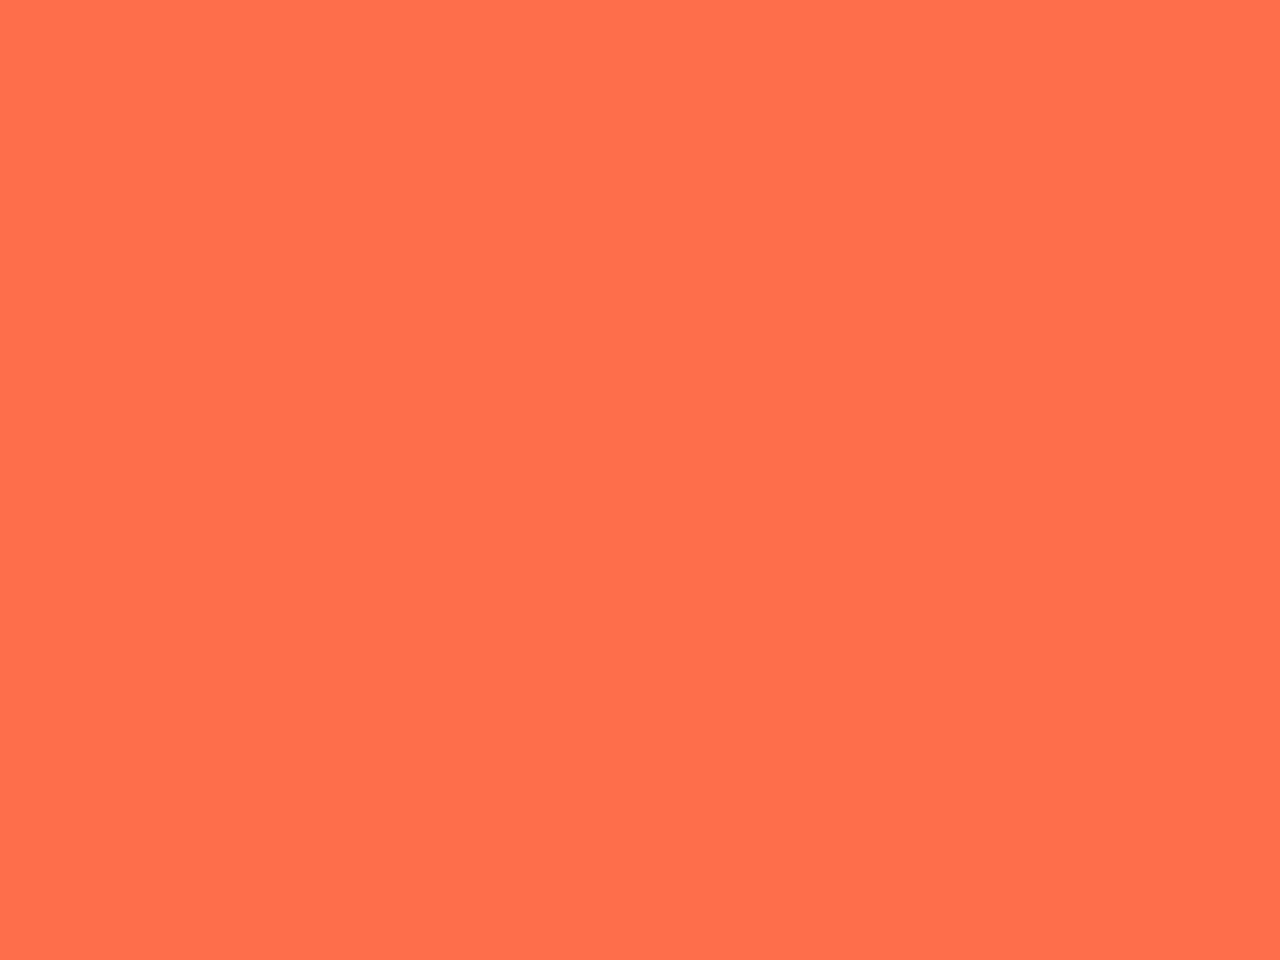 1280x960 Outrageous Orange Solid Color Background